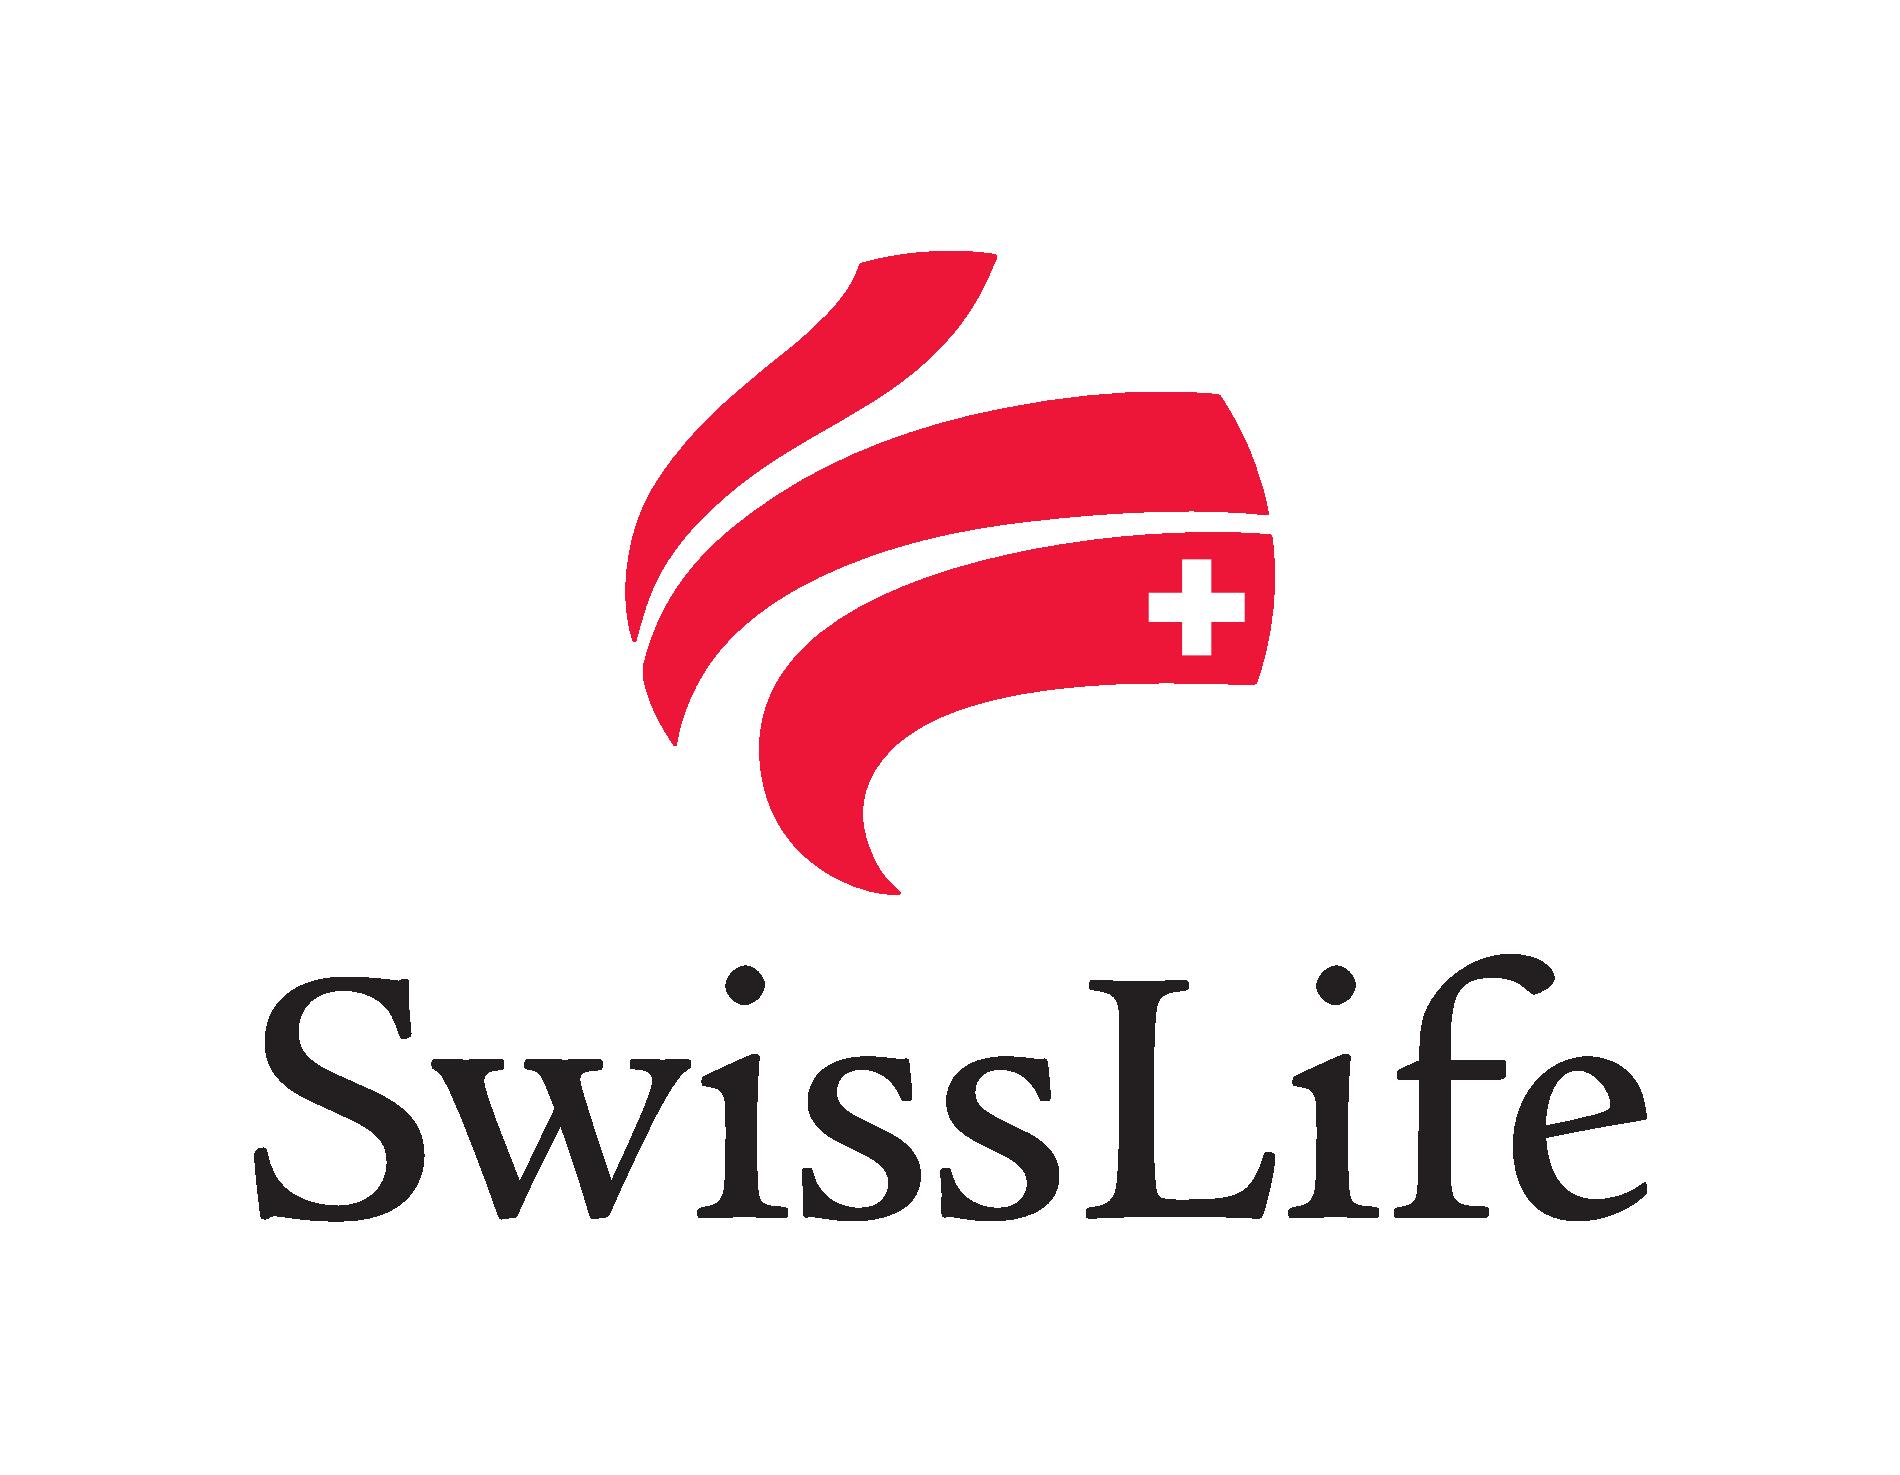 Life Font Partners